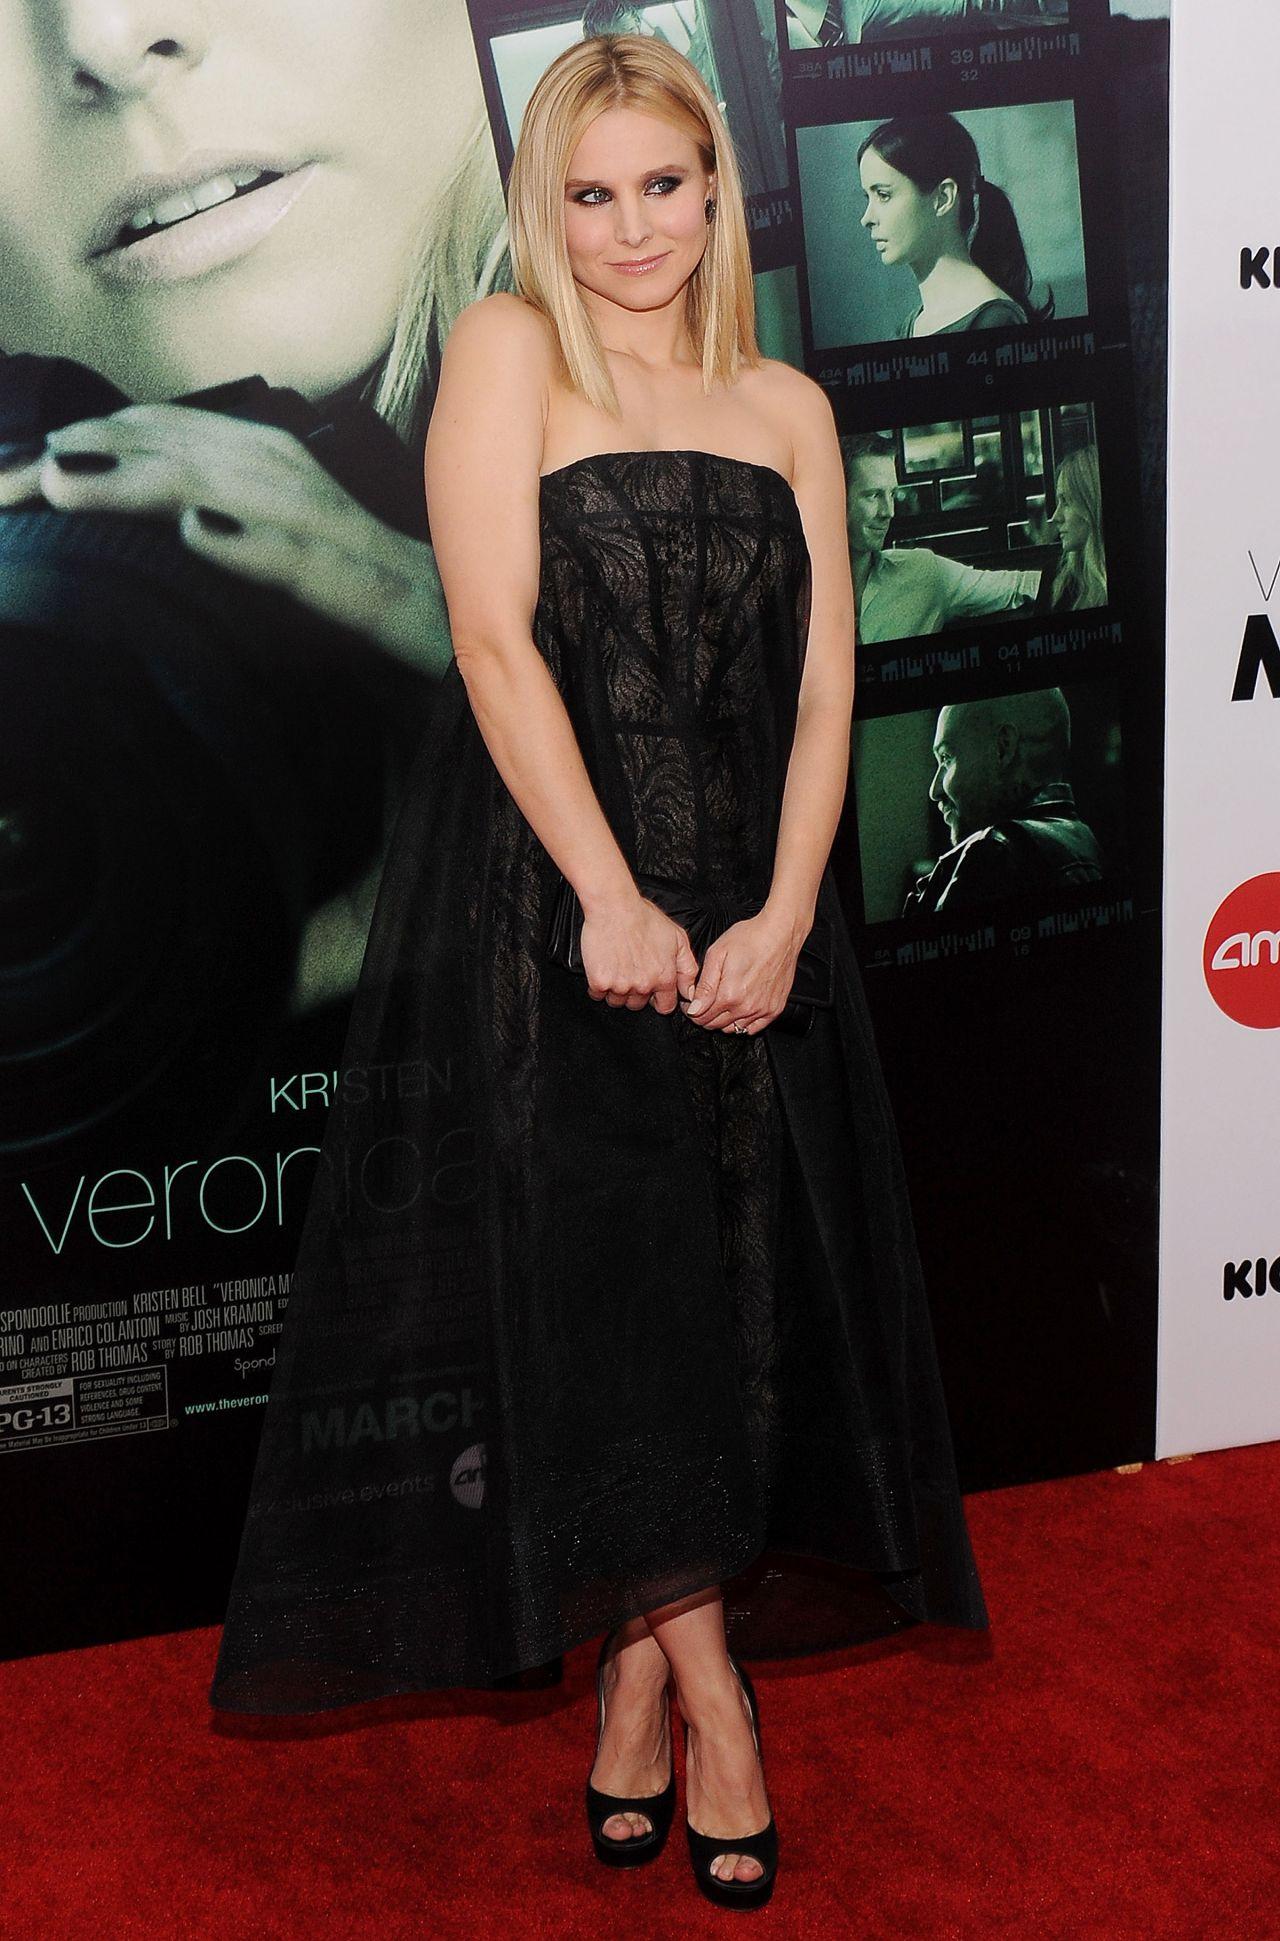 Kristen Bell On Red Carpet Veronica Mars Screening In